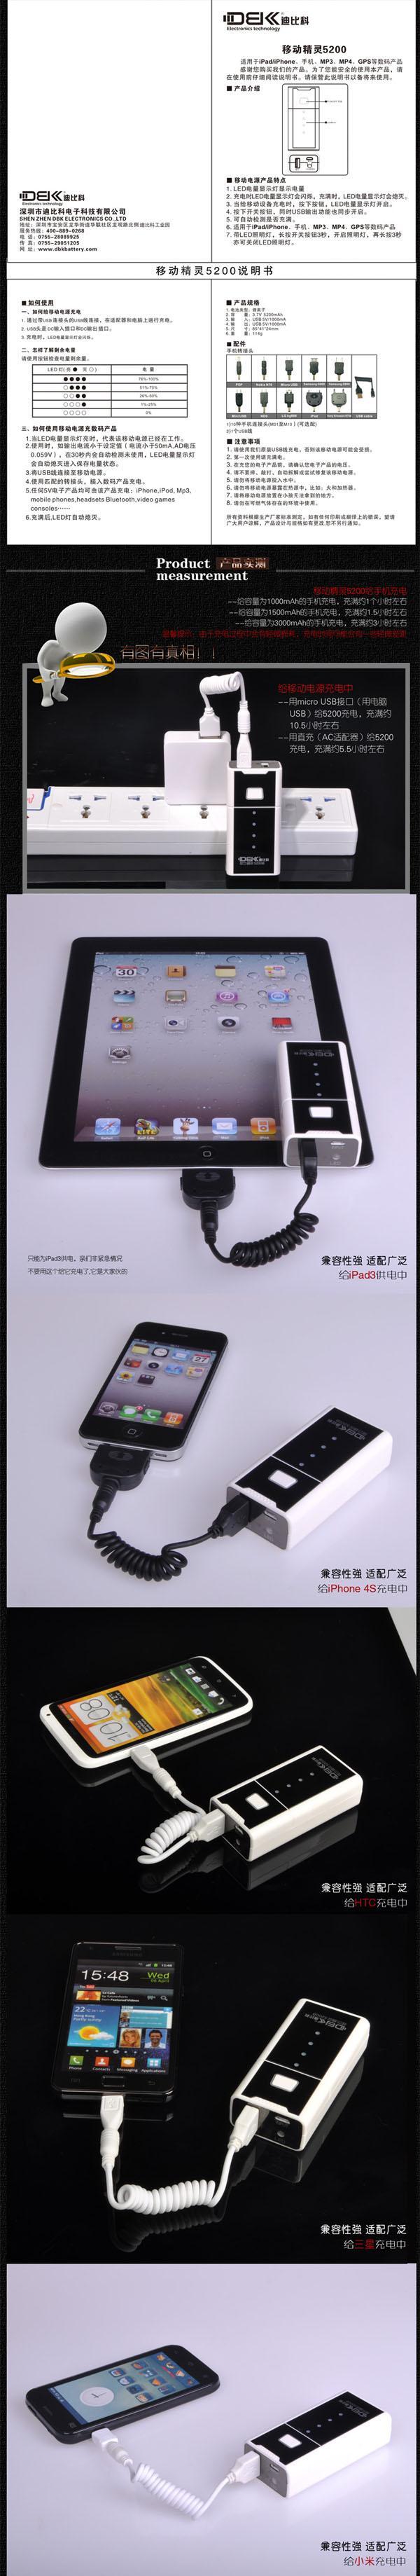 iphone4,三星(i9008除外),htc,黑莓,诺基亚,索尼,lg,摩托罗拉,小米